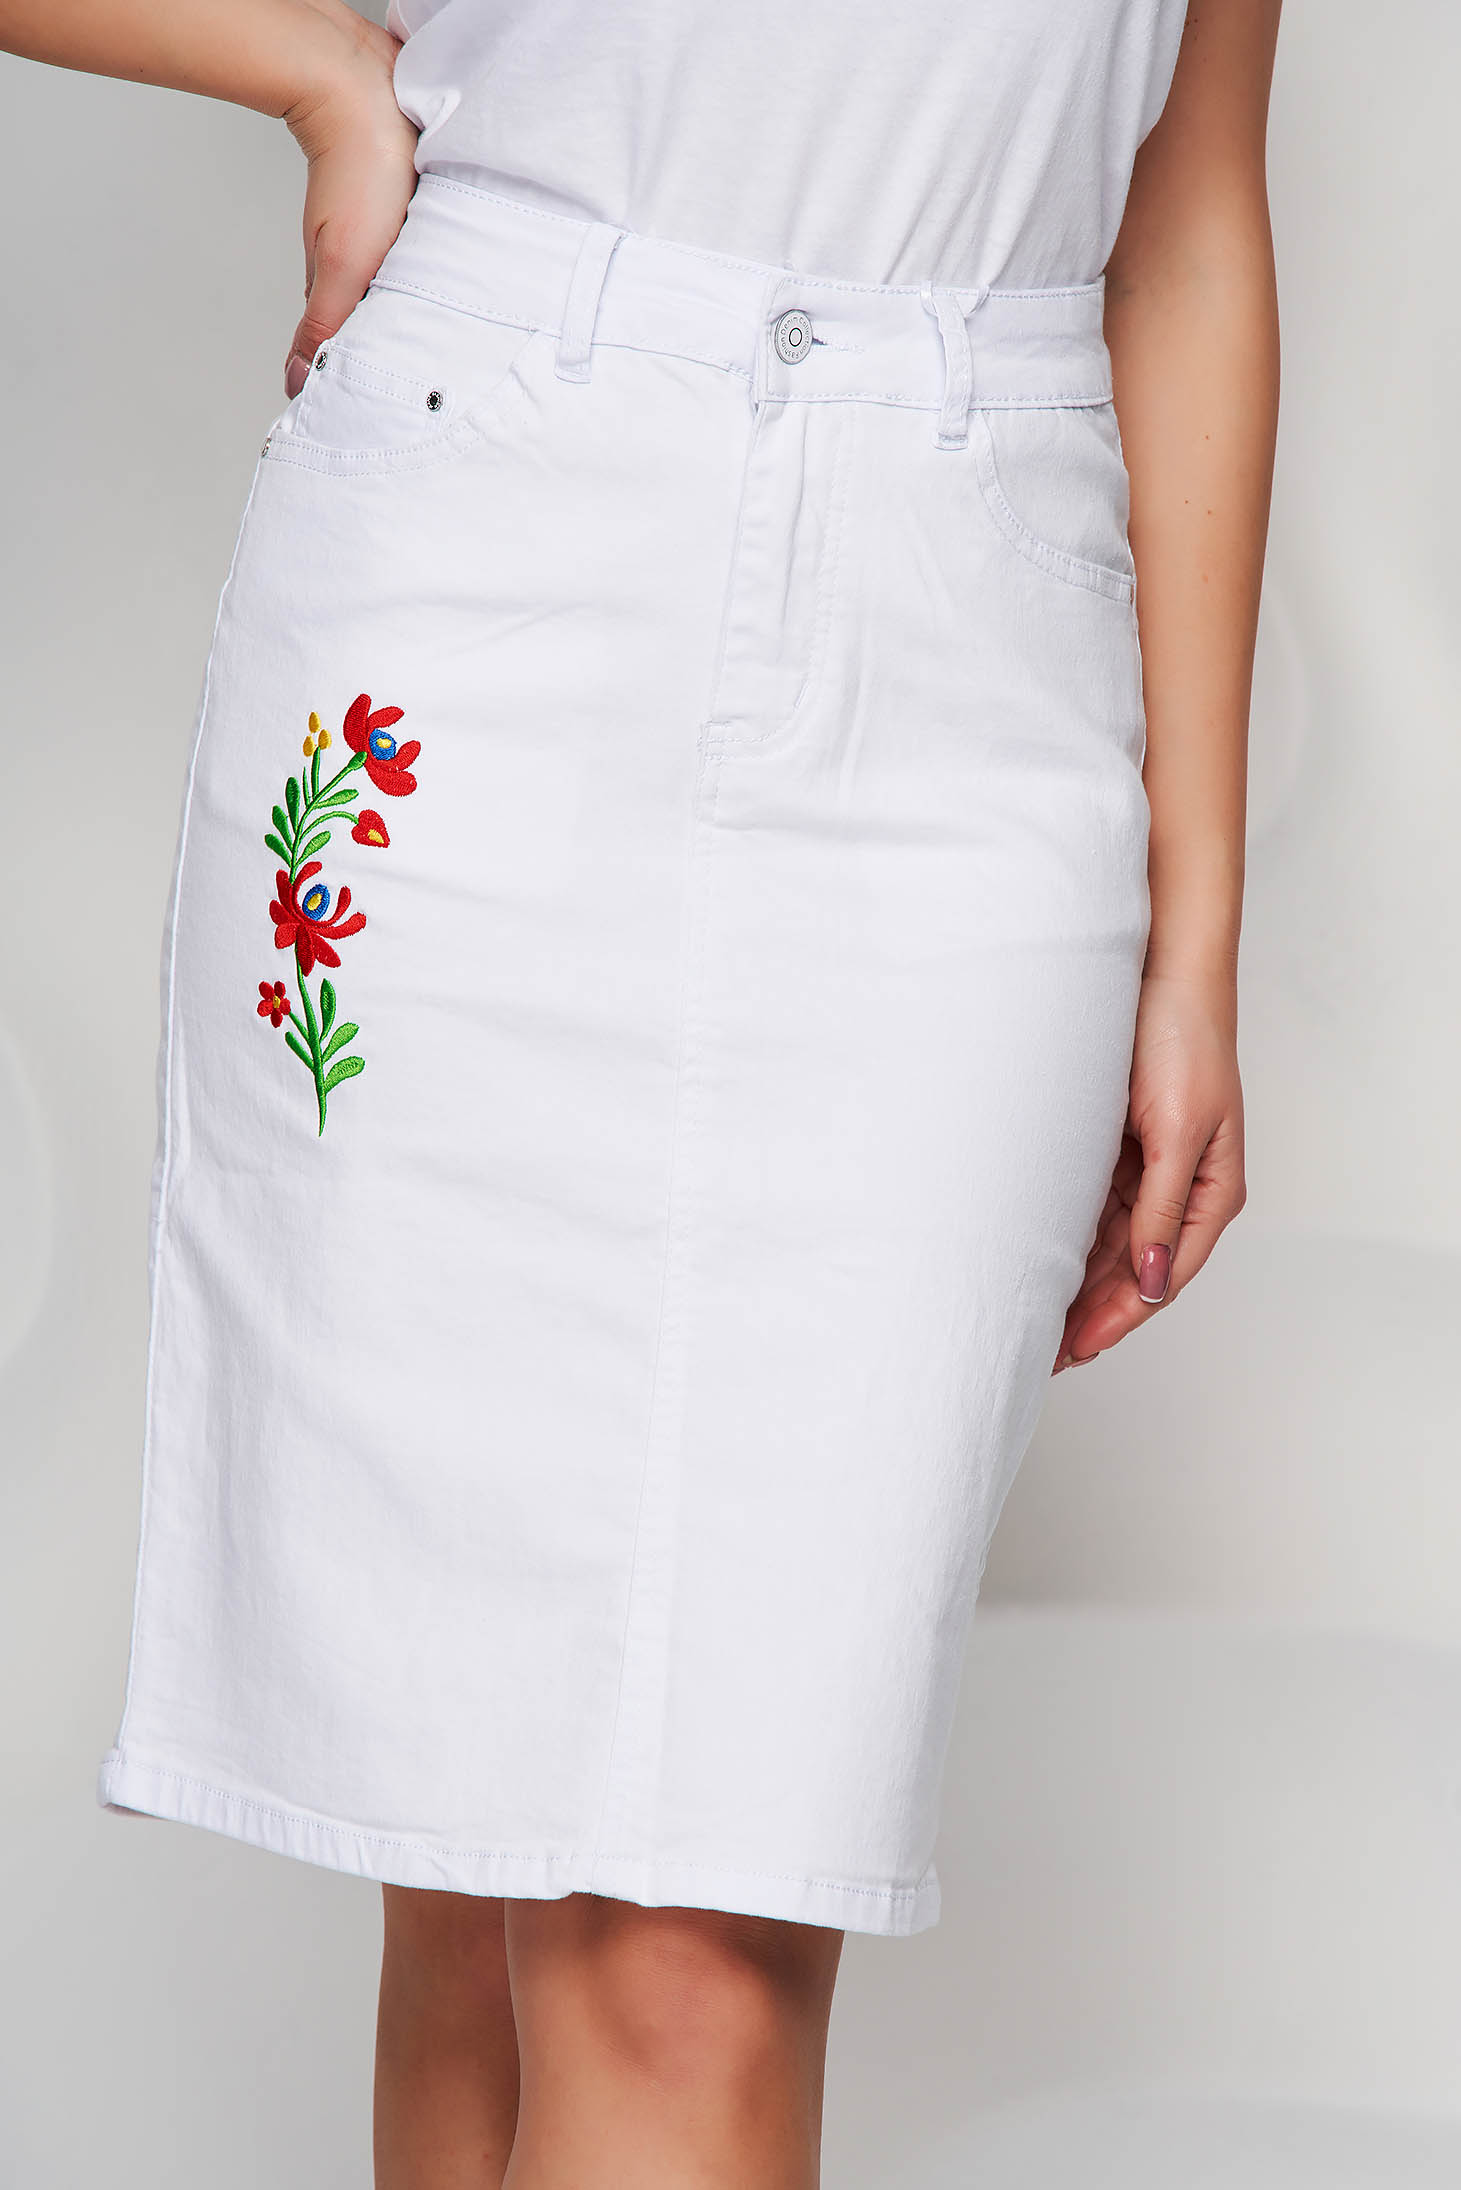 White skirt denim high waisted embroidered midi straight